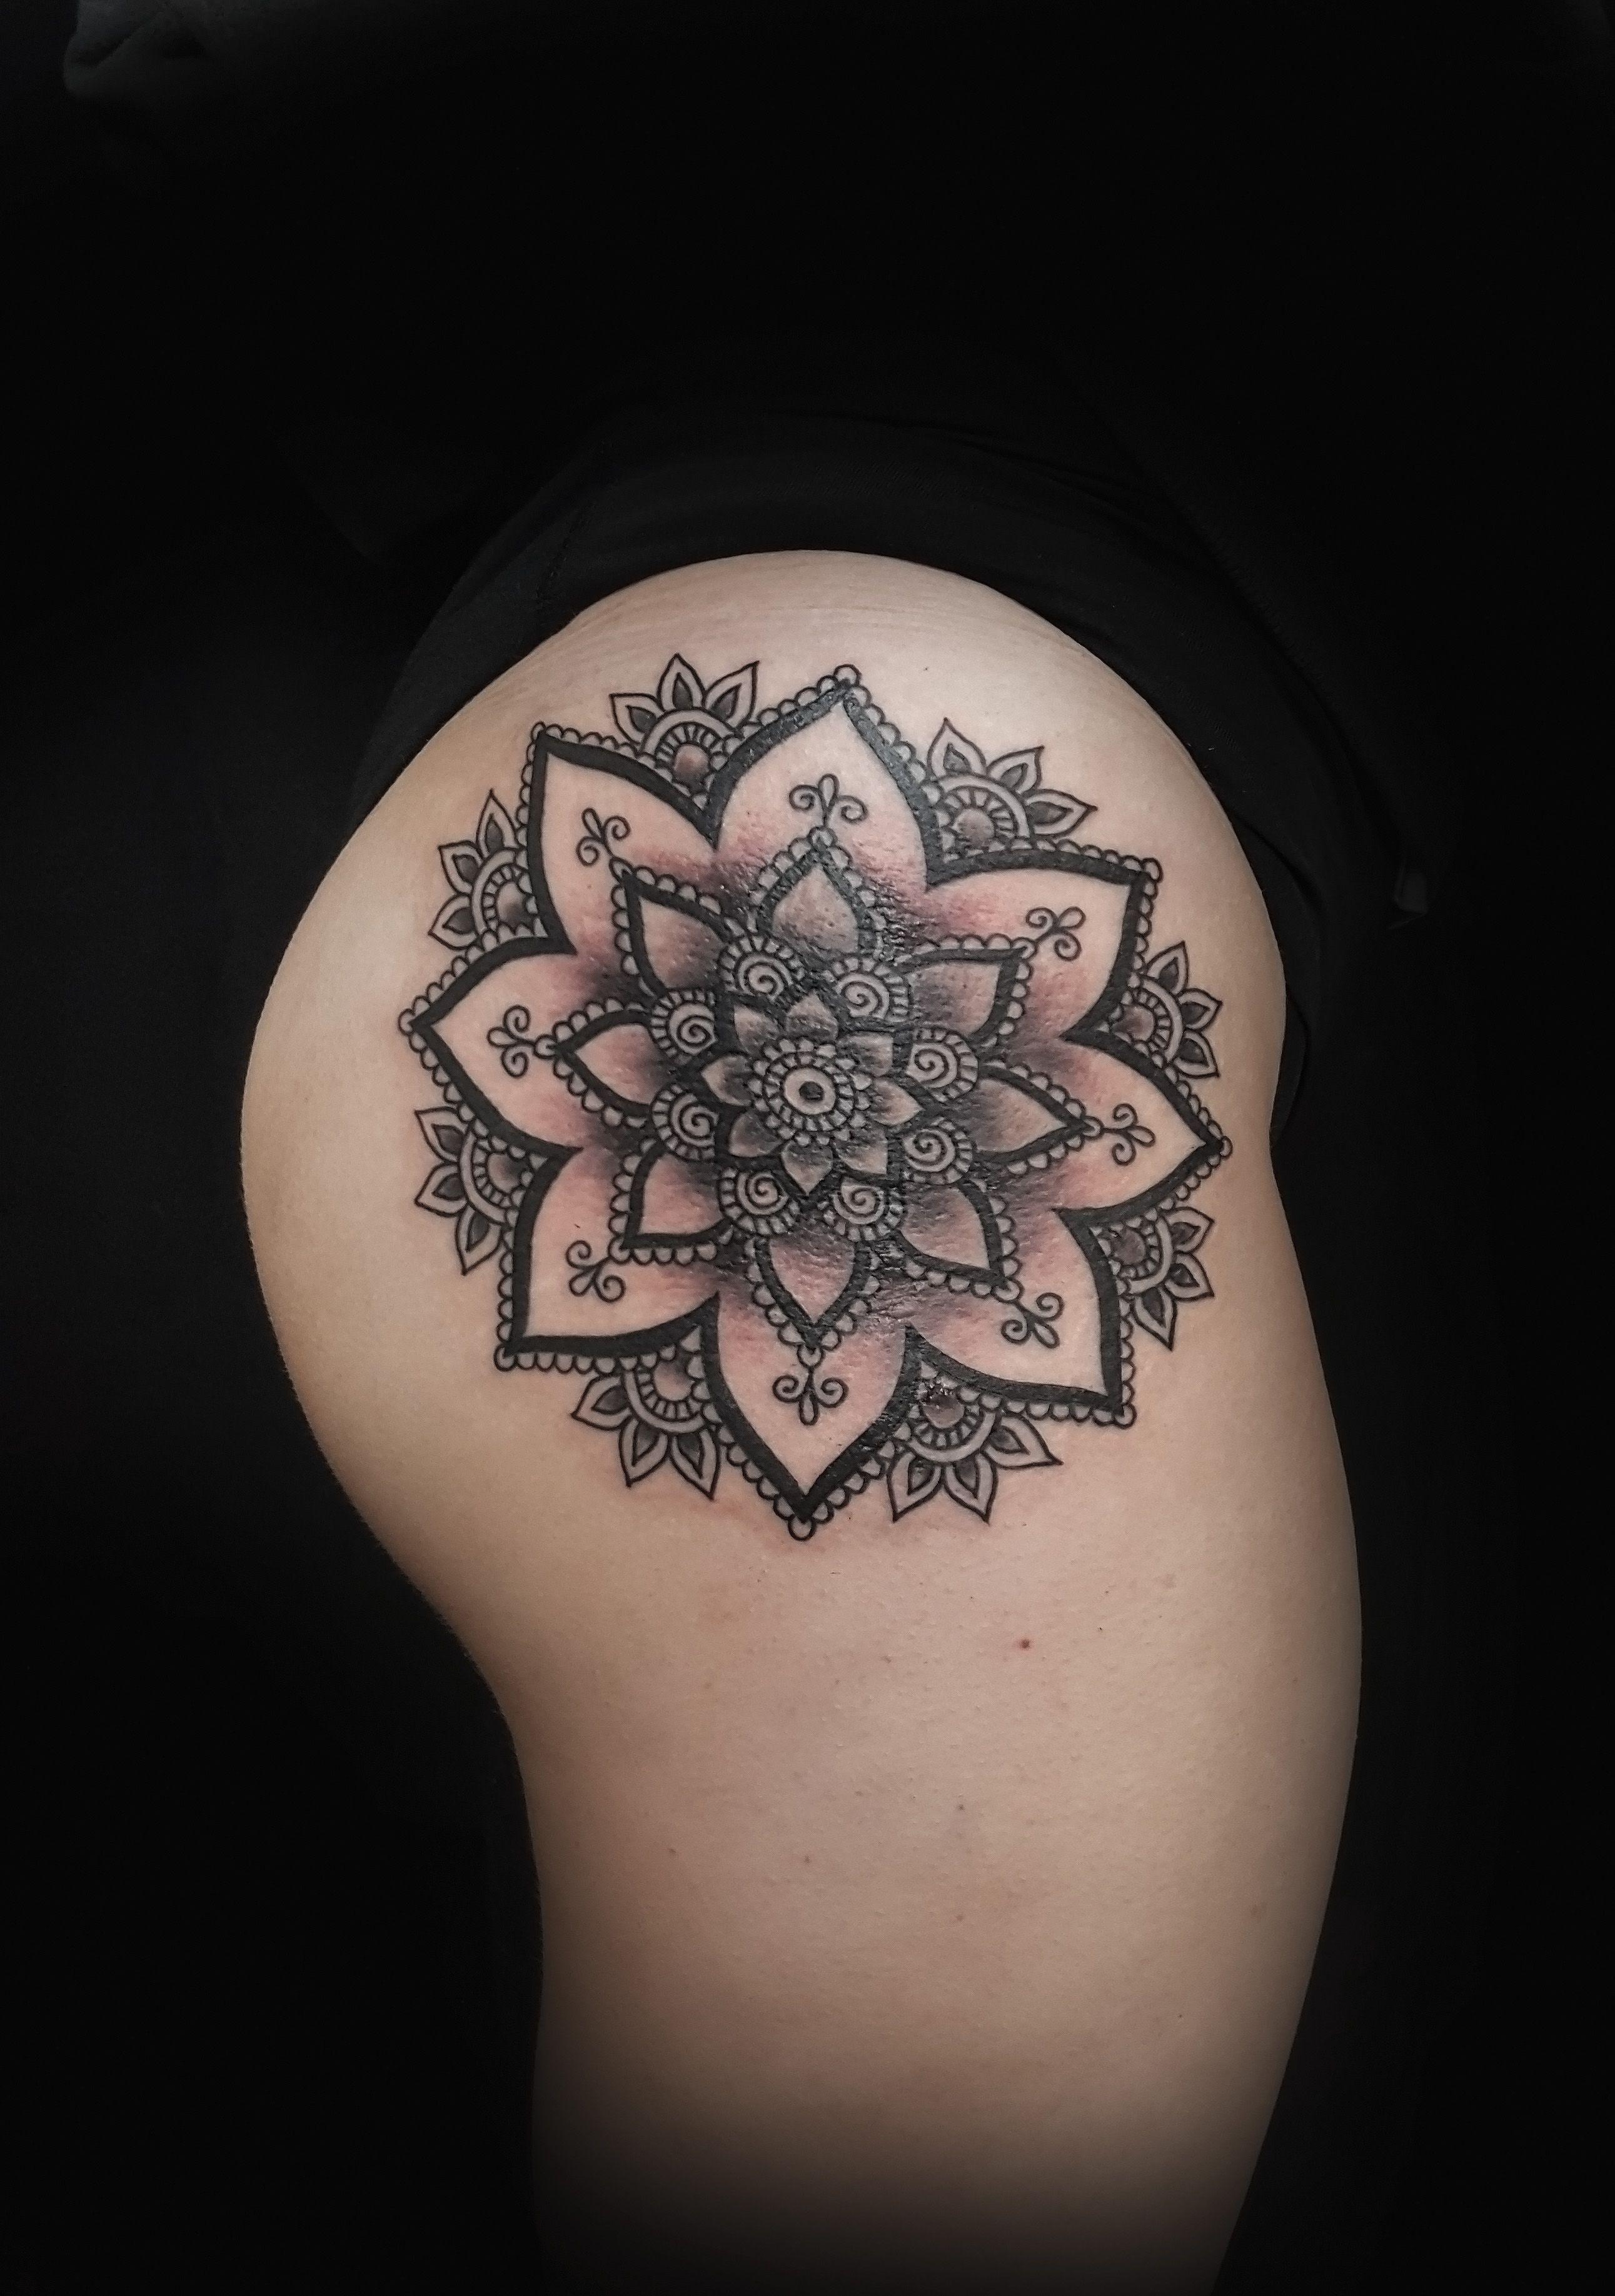 Mike evans tattoos elite skin art mandala tattoo girl